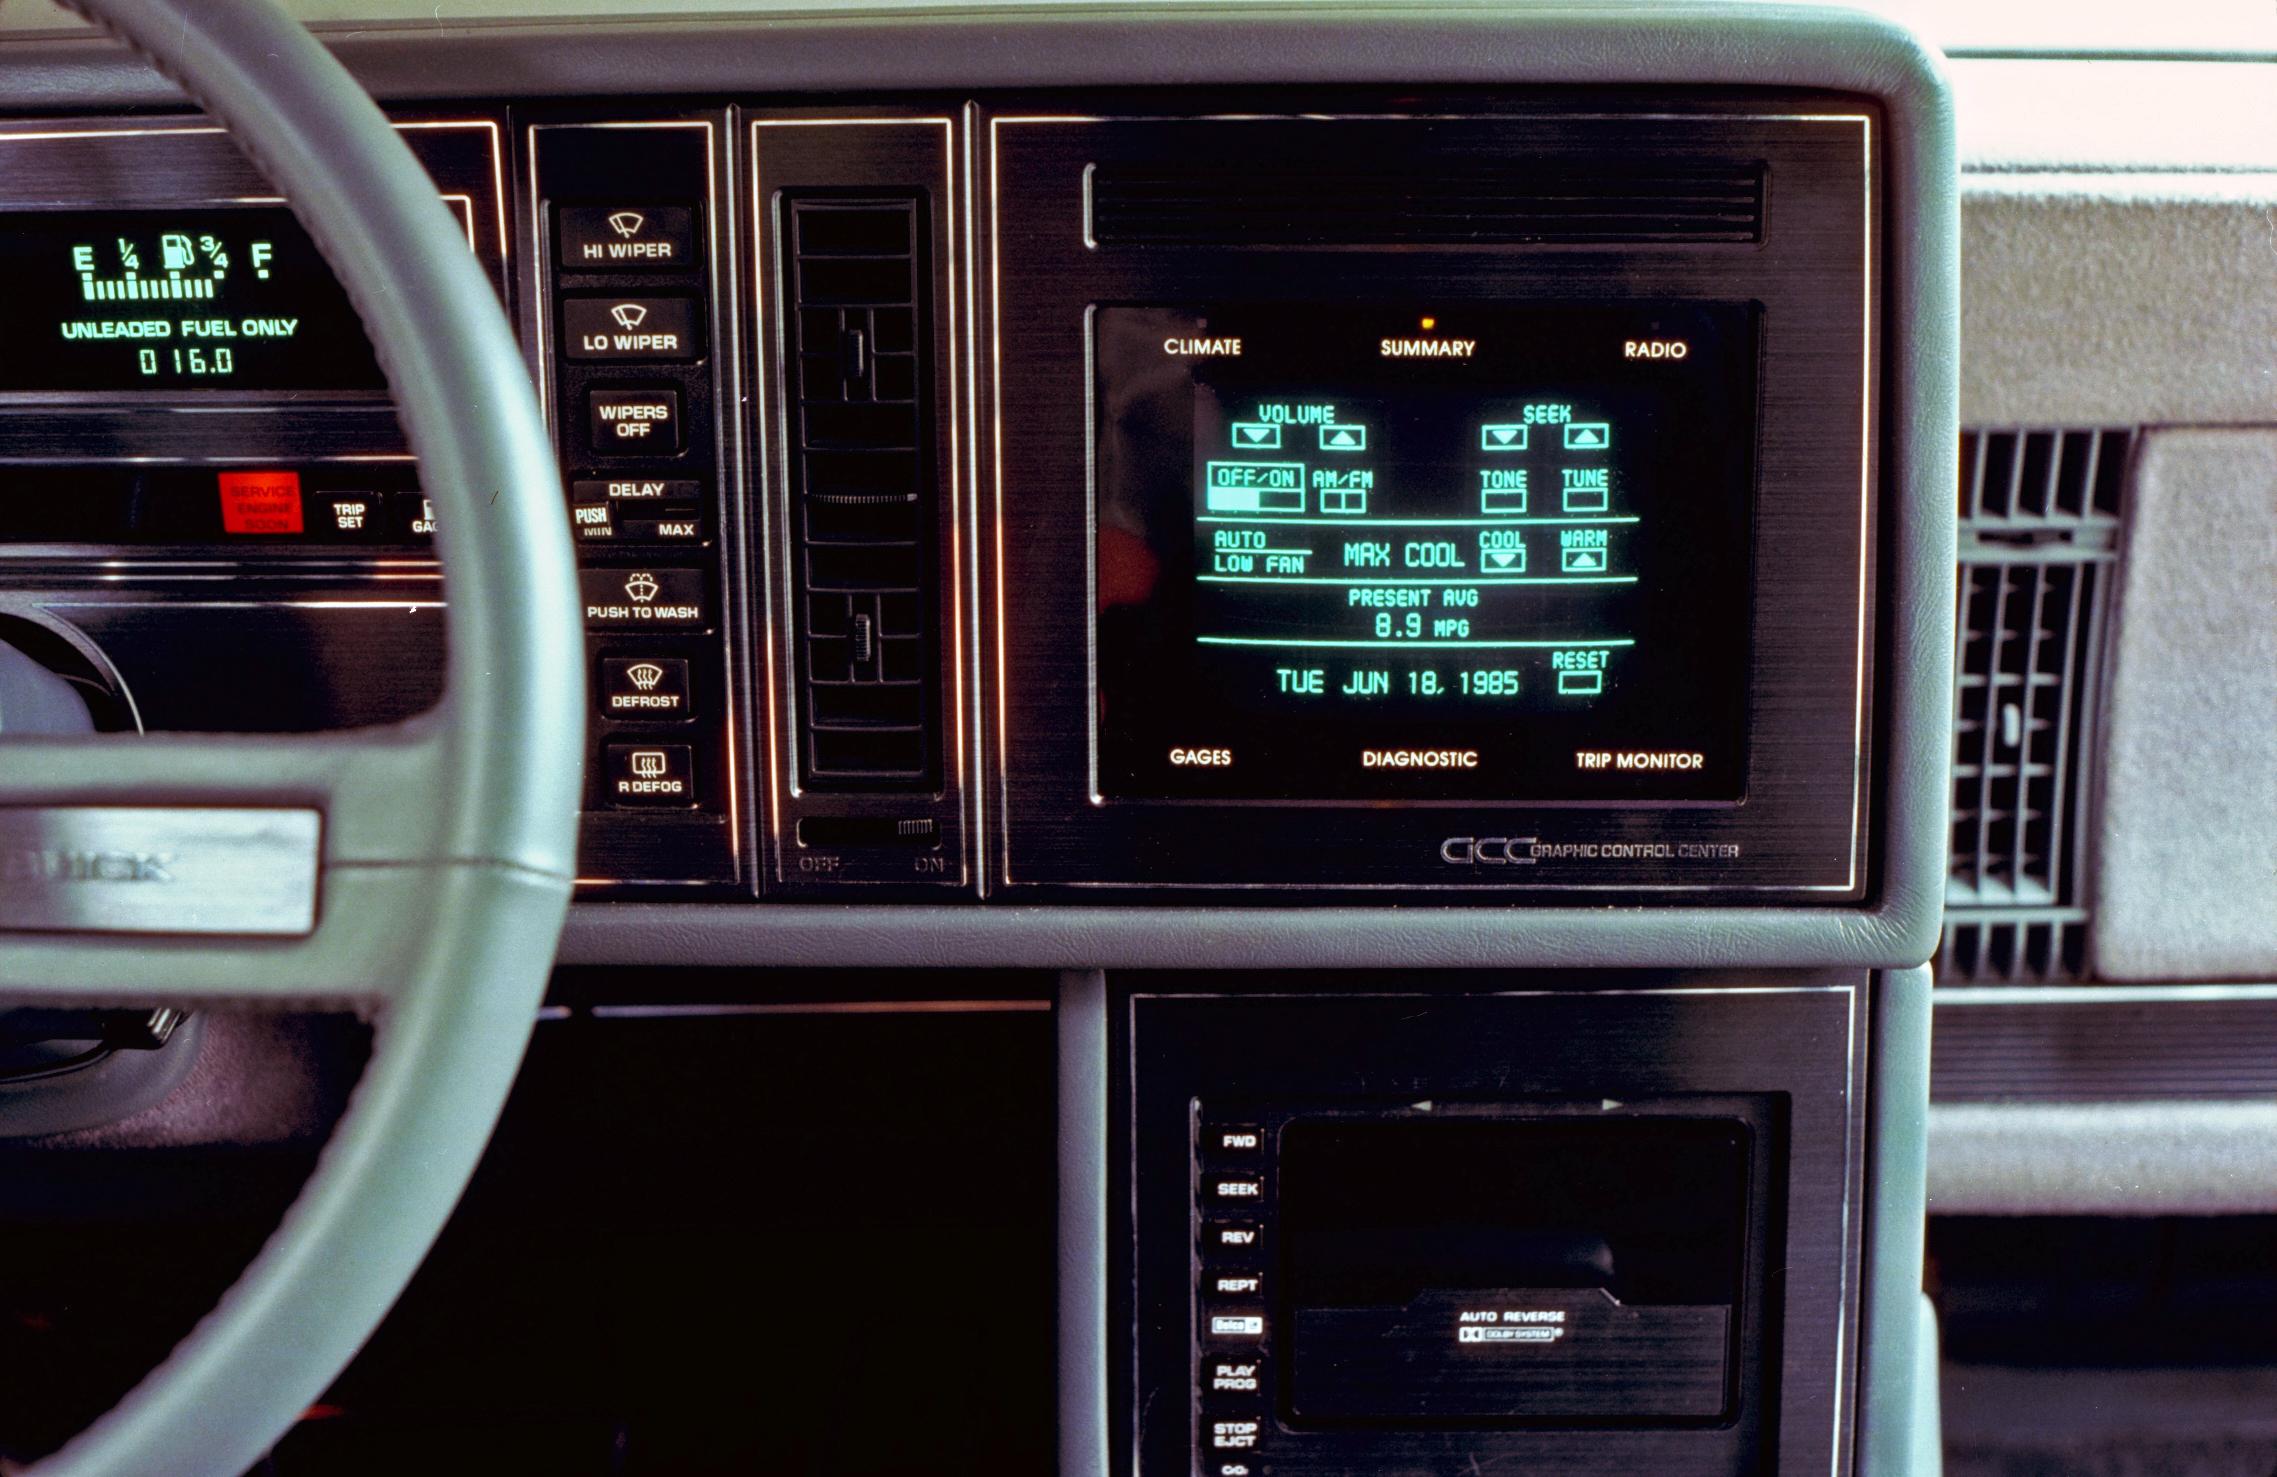 1986 Buick Riviera GCC Touchscreen climate